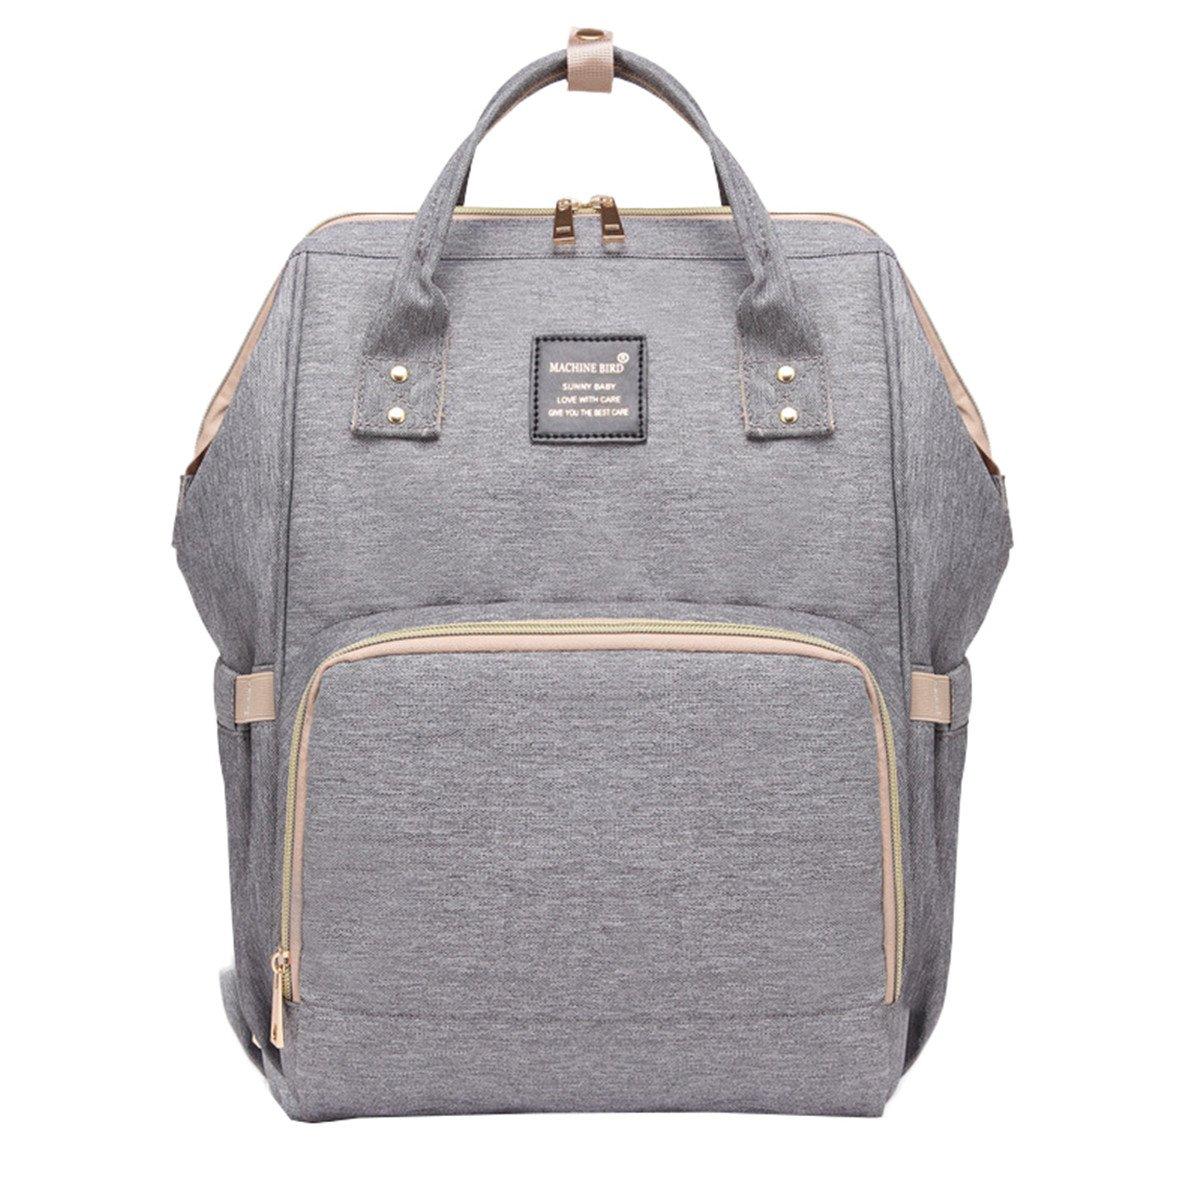 Quanjie Diaper Bag Multifunction Women Backpack Stylish Mummy Bag Nylon Nappy Bags Large Capacity Travel Waterproof Daypack(gray)